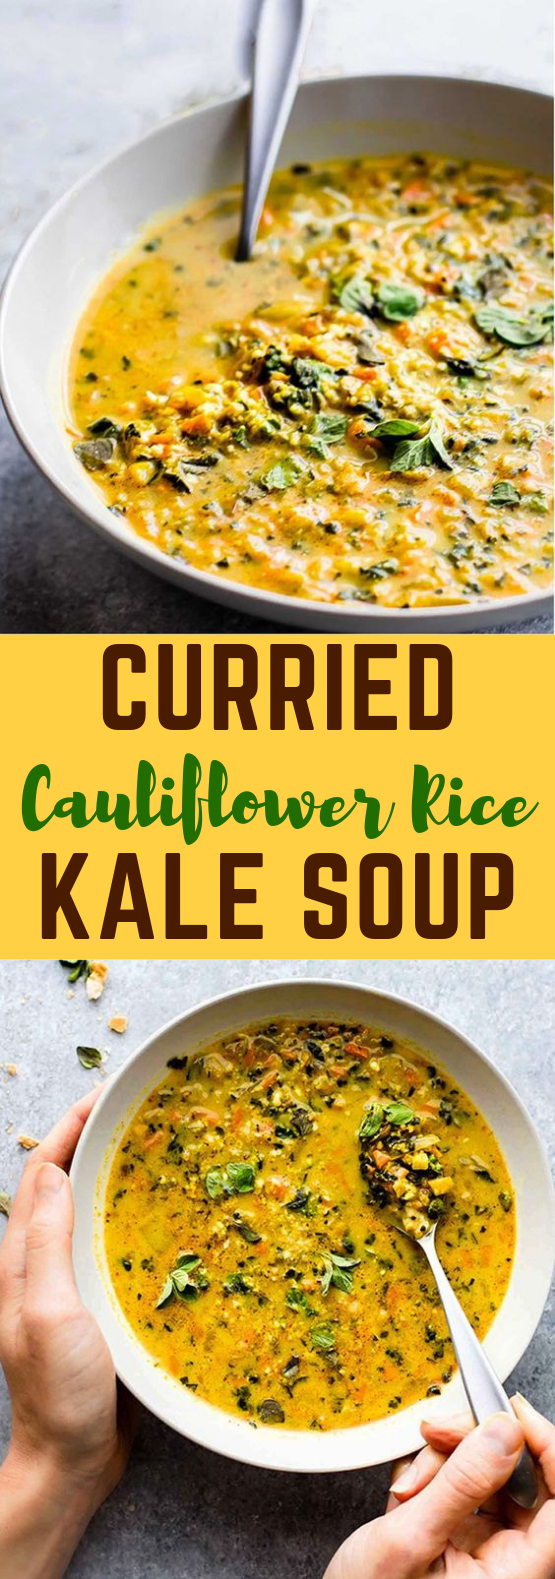 curried cauliflower rice kale soup {paleo, vegan friendly} #Vegetarian #Veggies